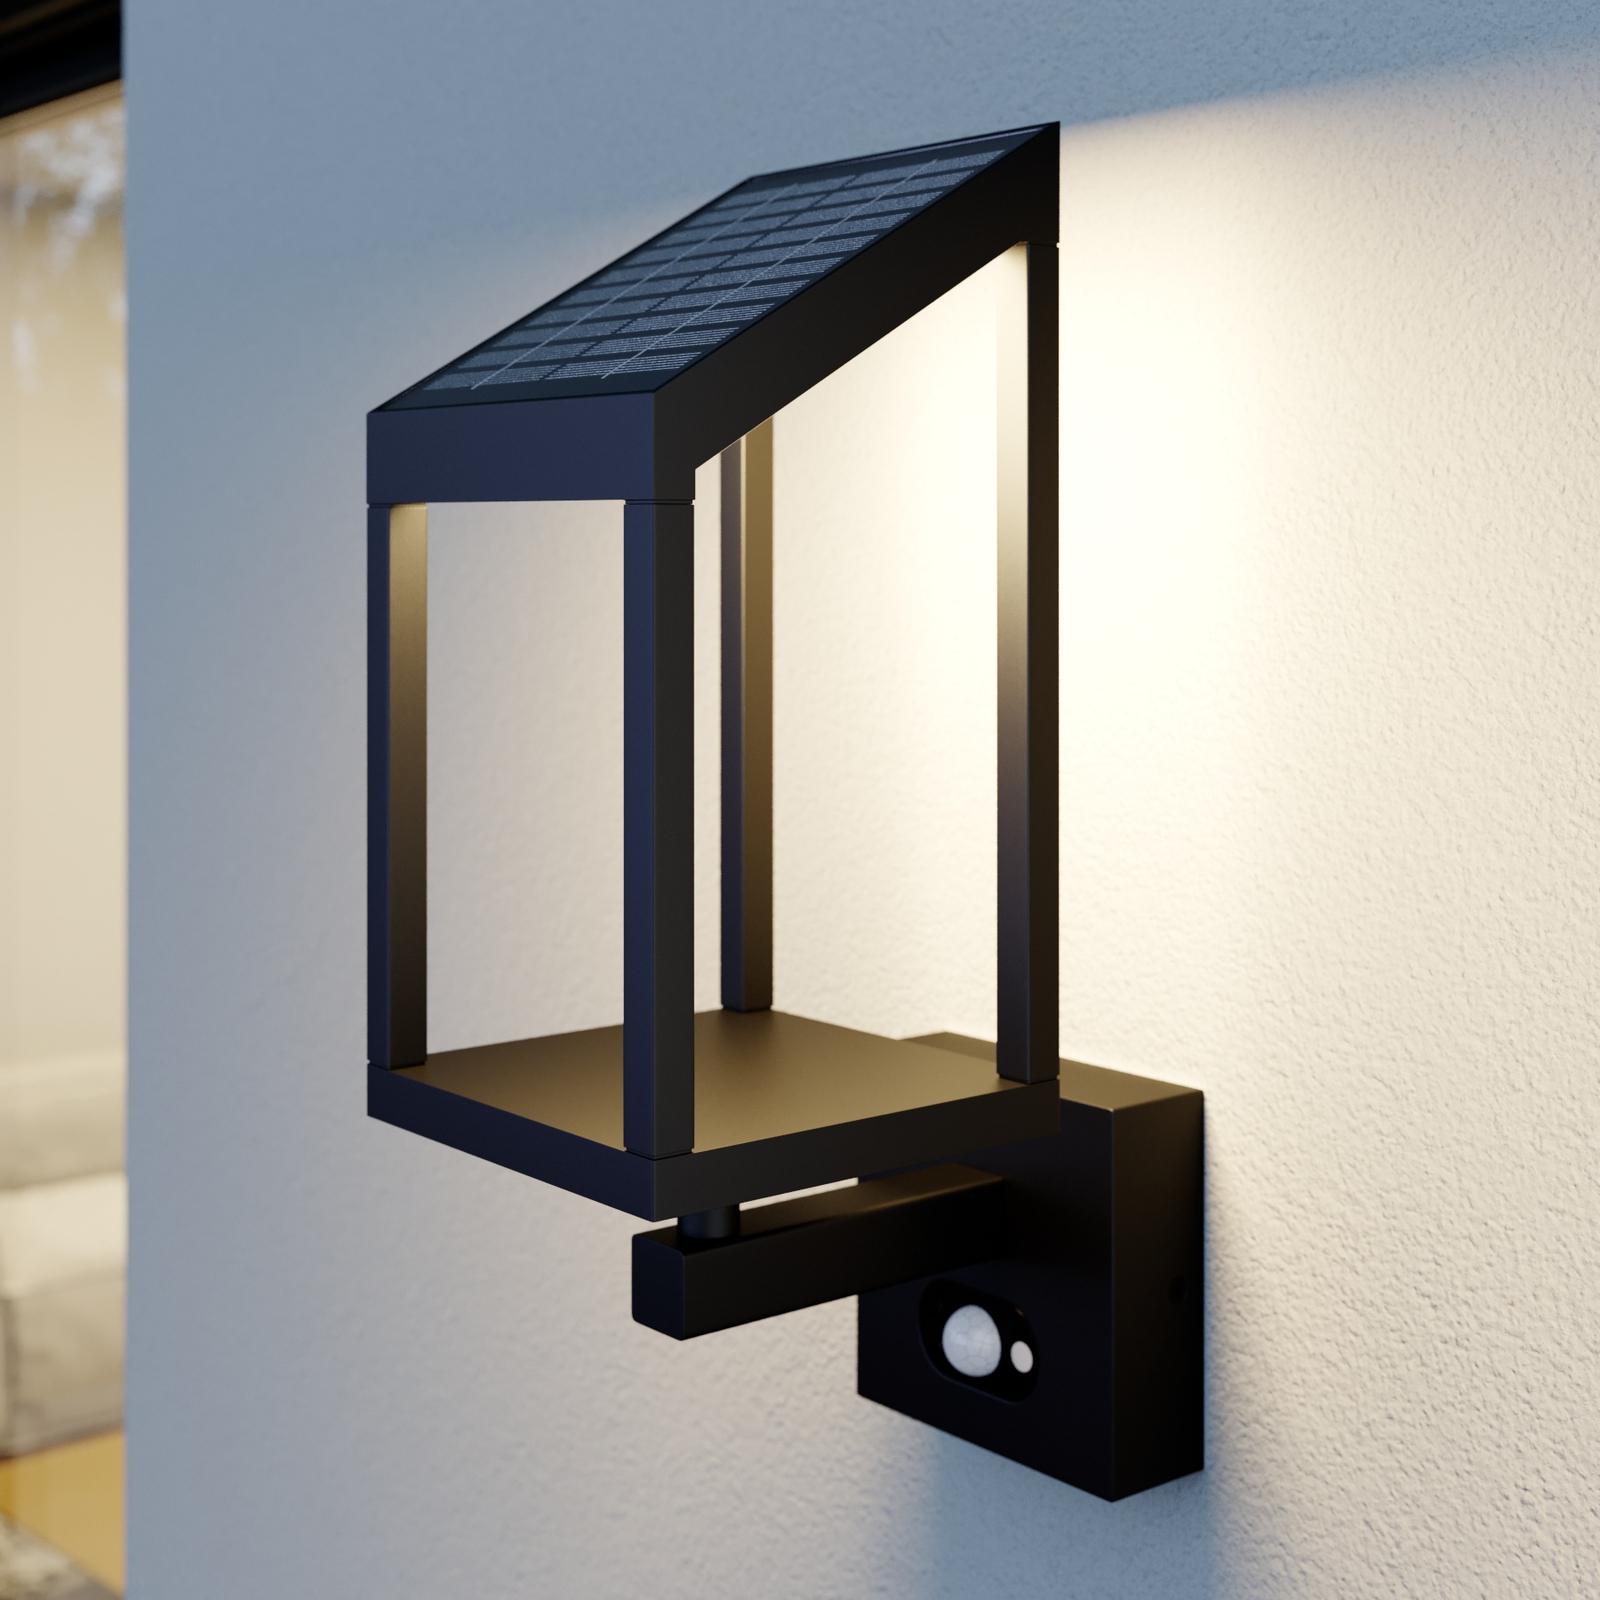 Lucande Timeo solcellsdriven LED-utomhusvägglampa